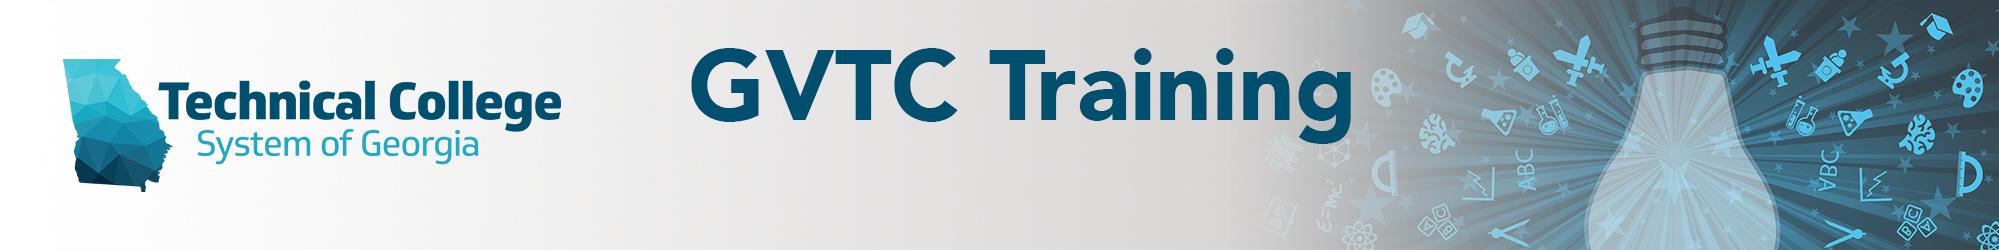 GVTC Training